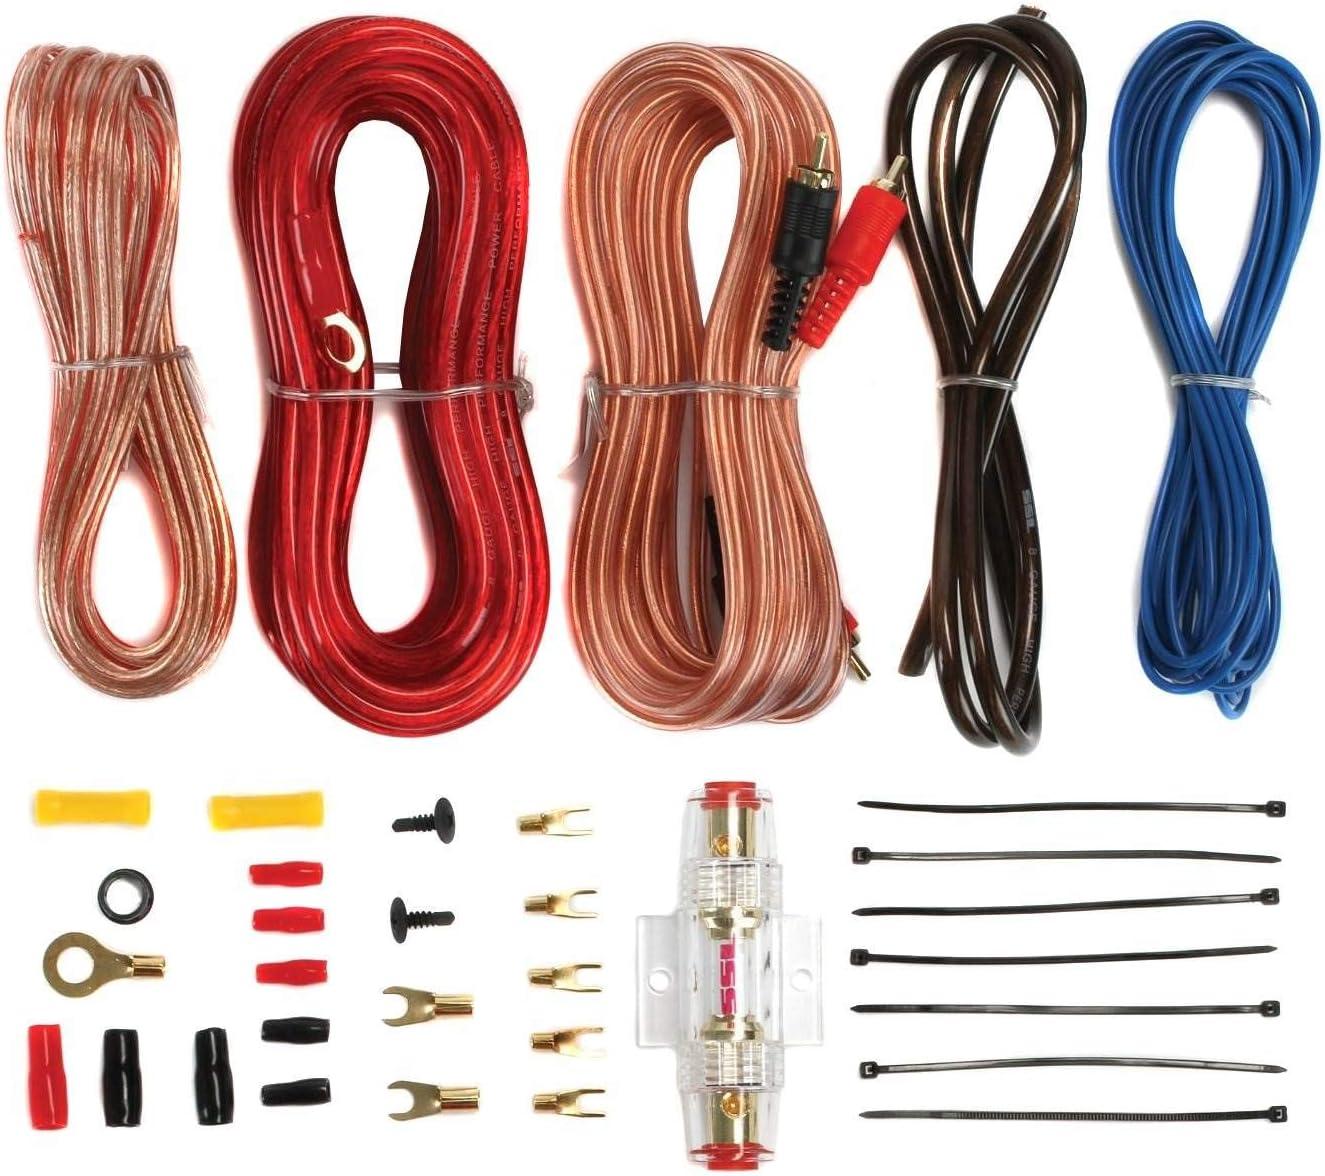 Kicker 44TCWC104 10 600W Subwoofer+Slim Box+Boss AR1500M 1500W Mono Amp+Amp Kit